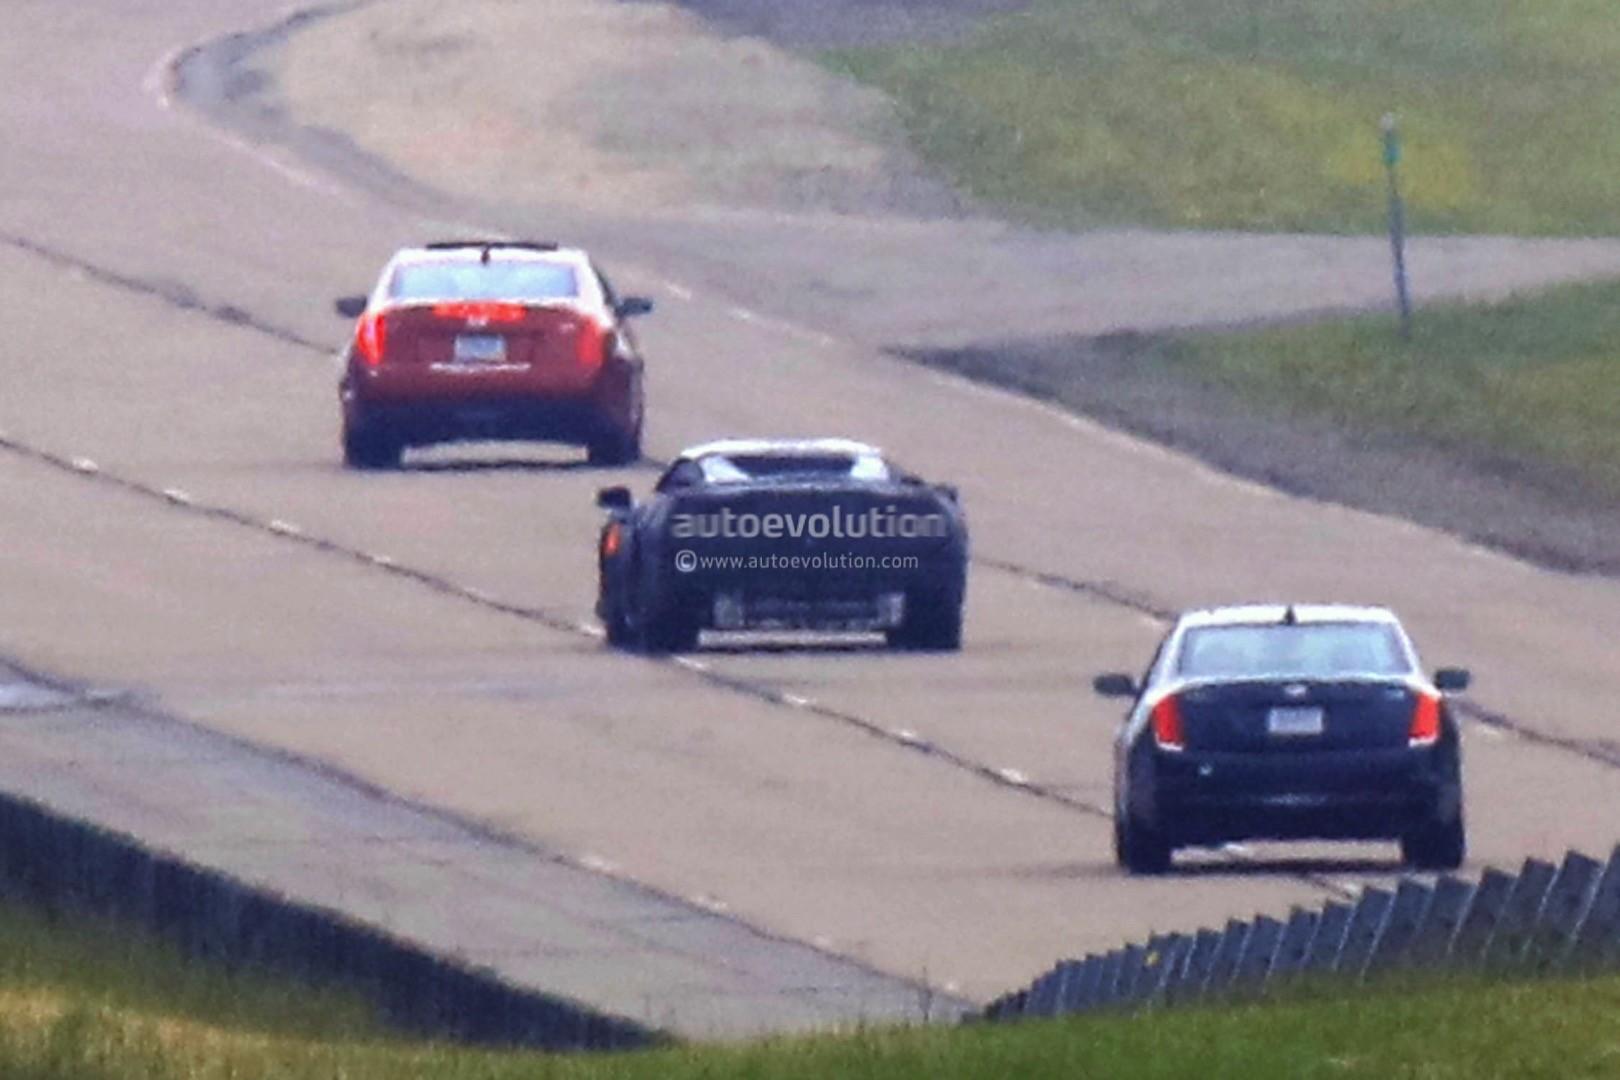 Corvette C8 2019 >> Mid-Engine 2019 Chevrolet Corvette (C8) Spied at GM Milford Proving Ground - autoevolution